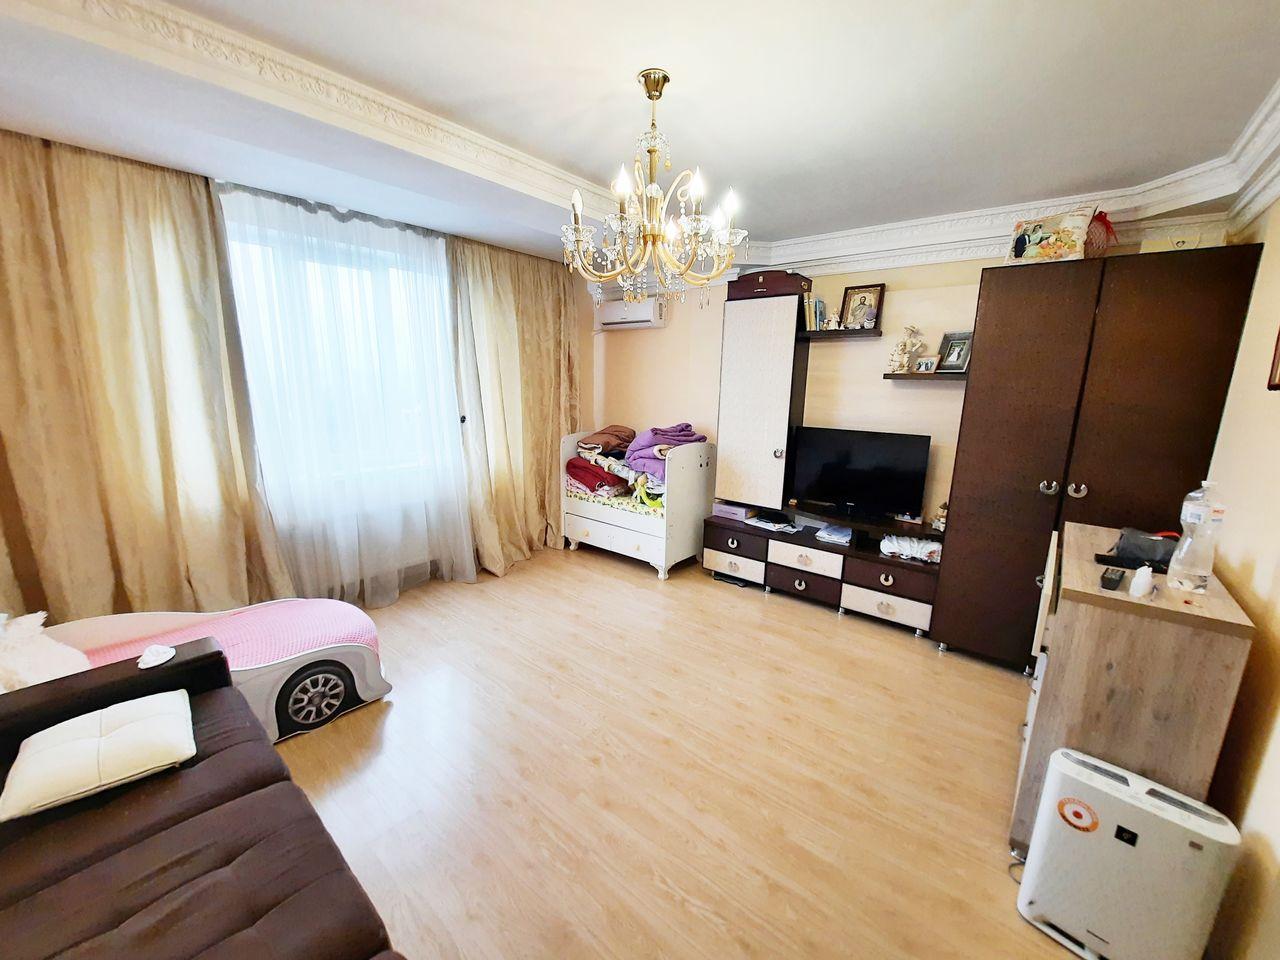 Apartament cu 1 cameră, mobilat, spațios, luminos